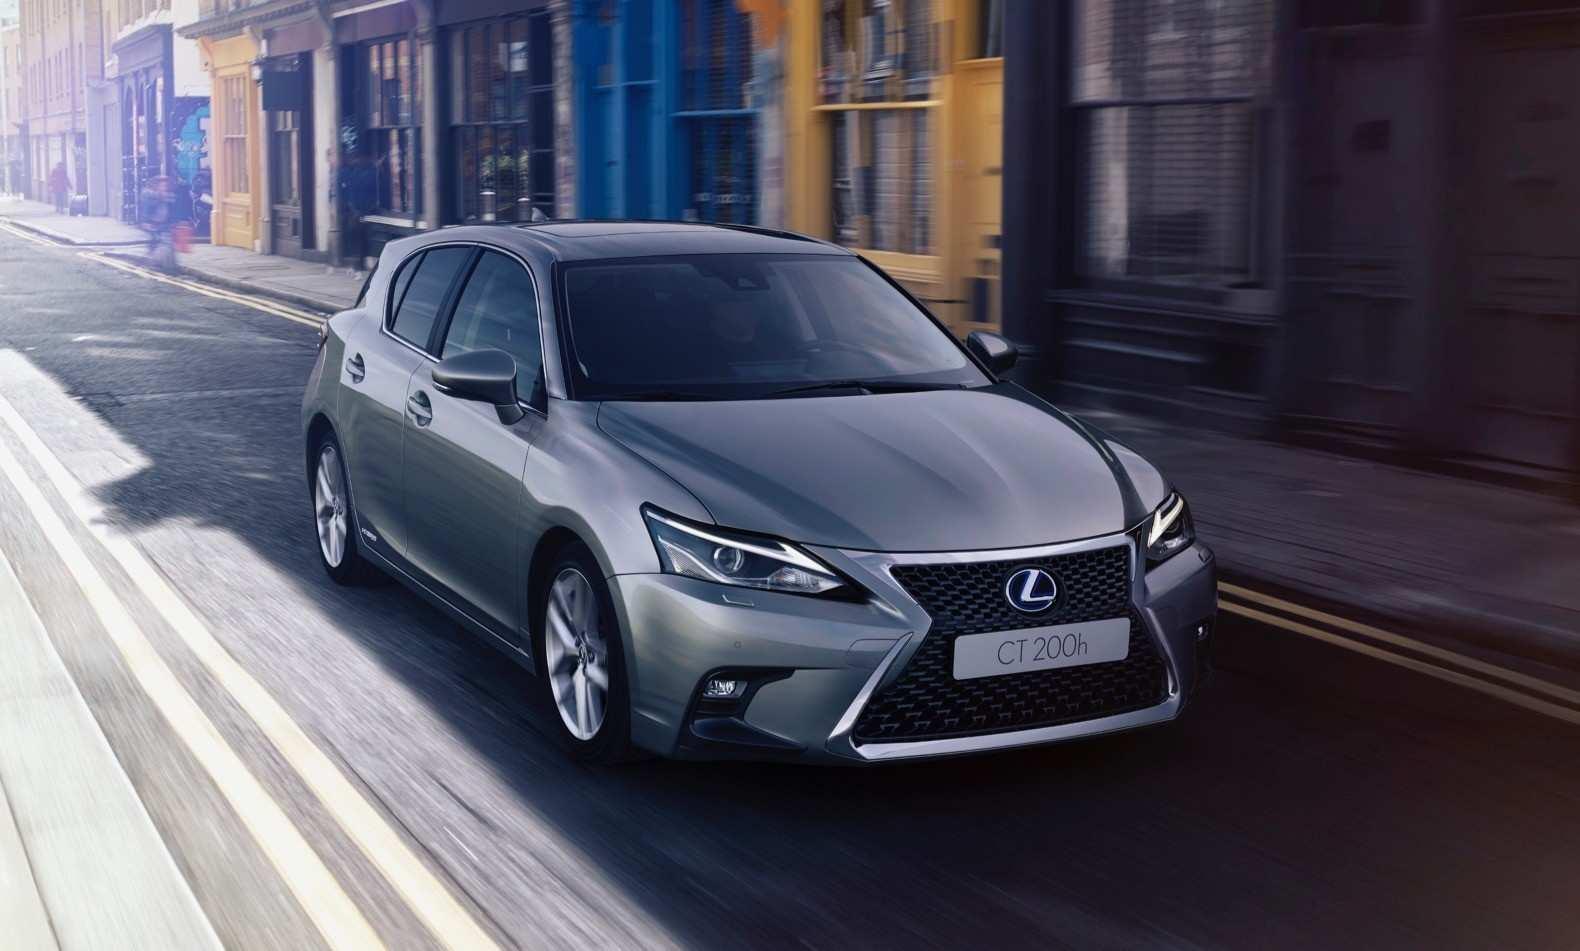 97 All New 2020 Lexus Hybrid Picture for 2020 Lexus Hybrid